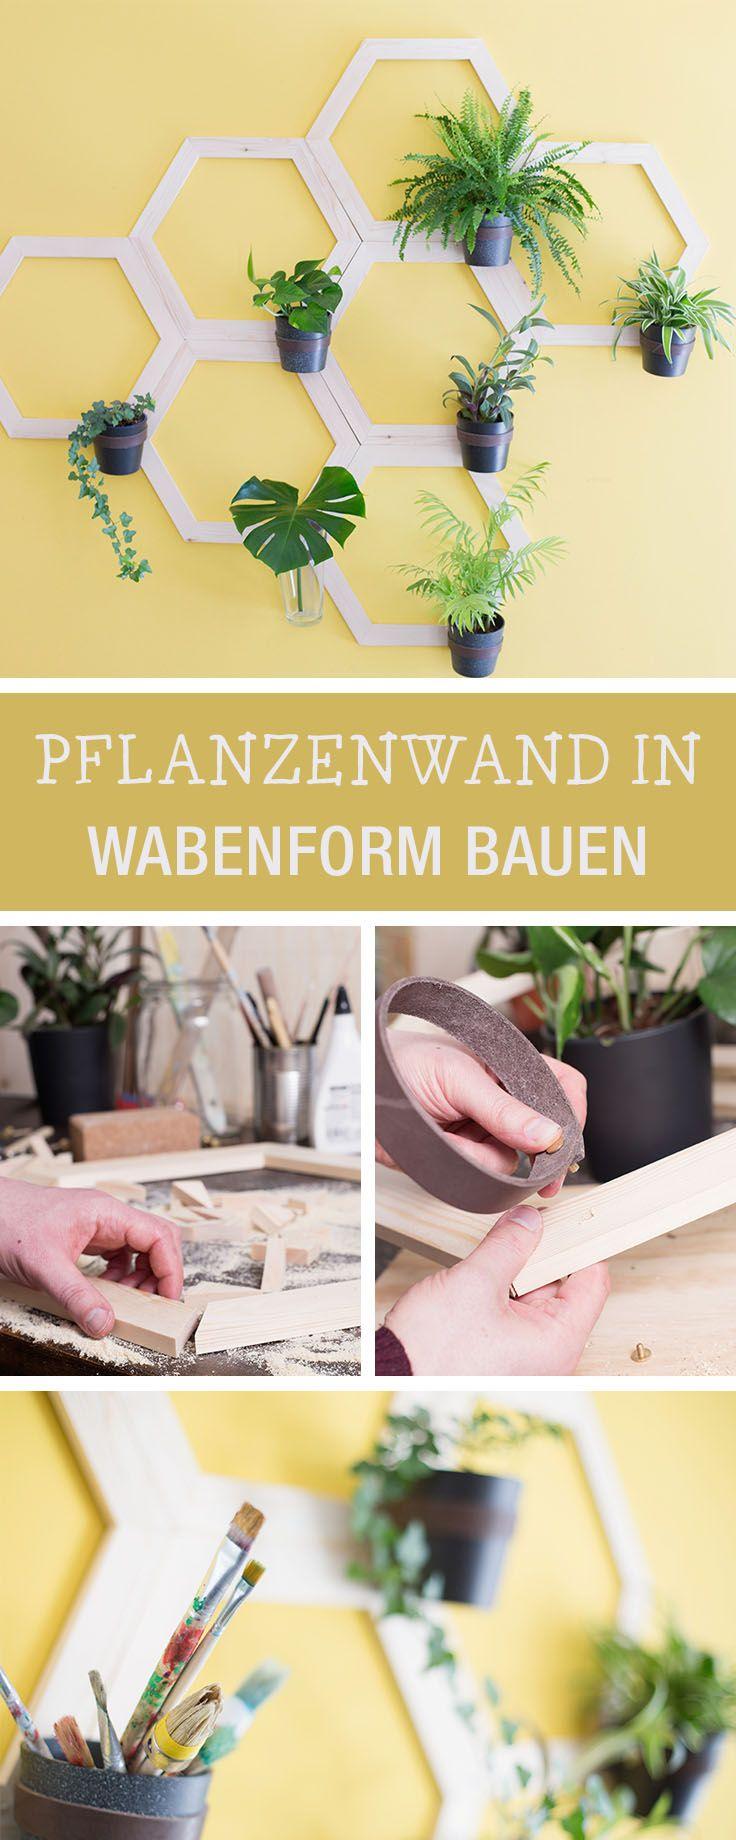 DIY-Anleitung: Pflanzenwand in Wabenform bauen via DaWanda.com ...